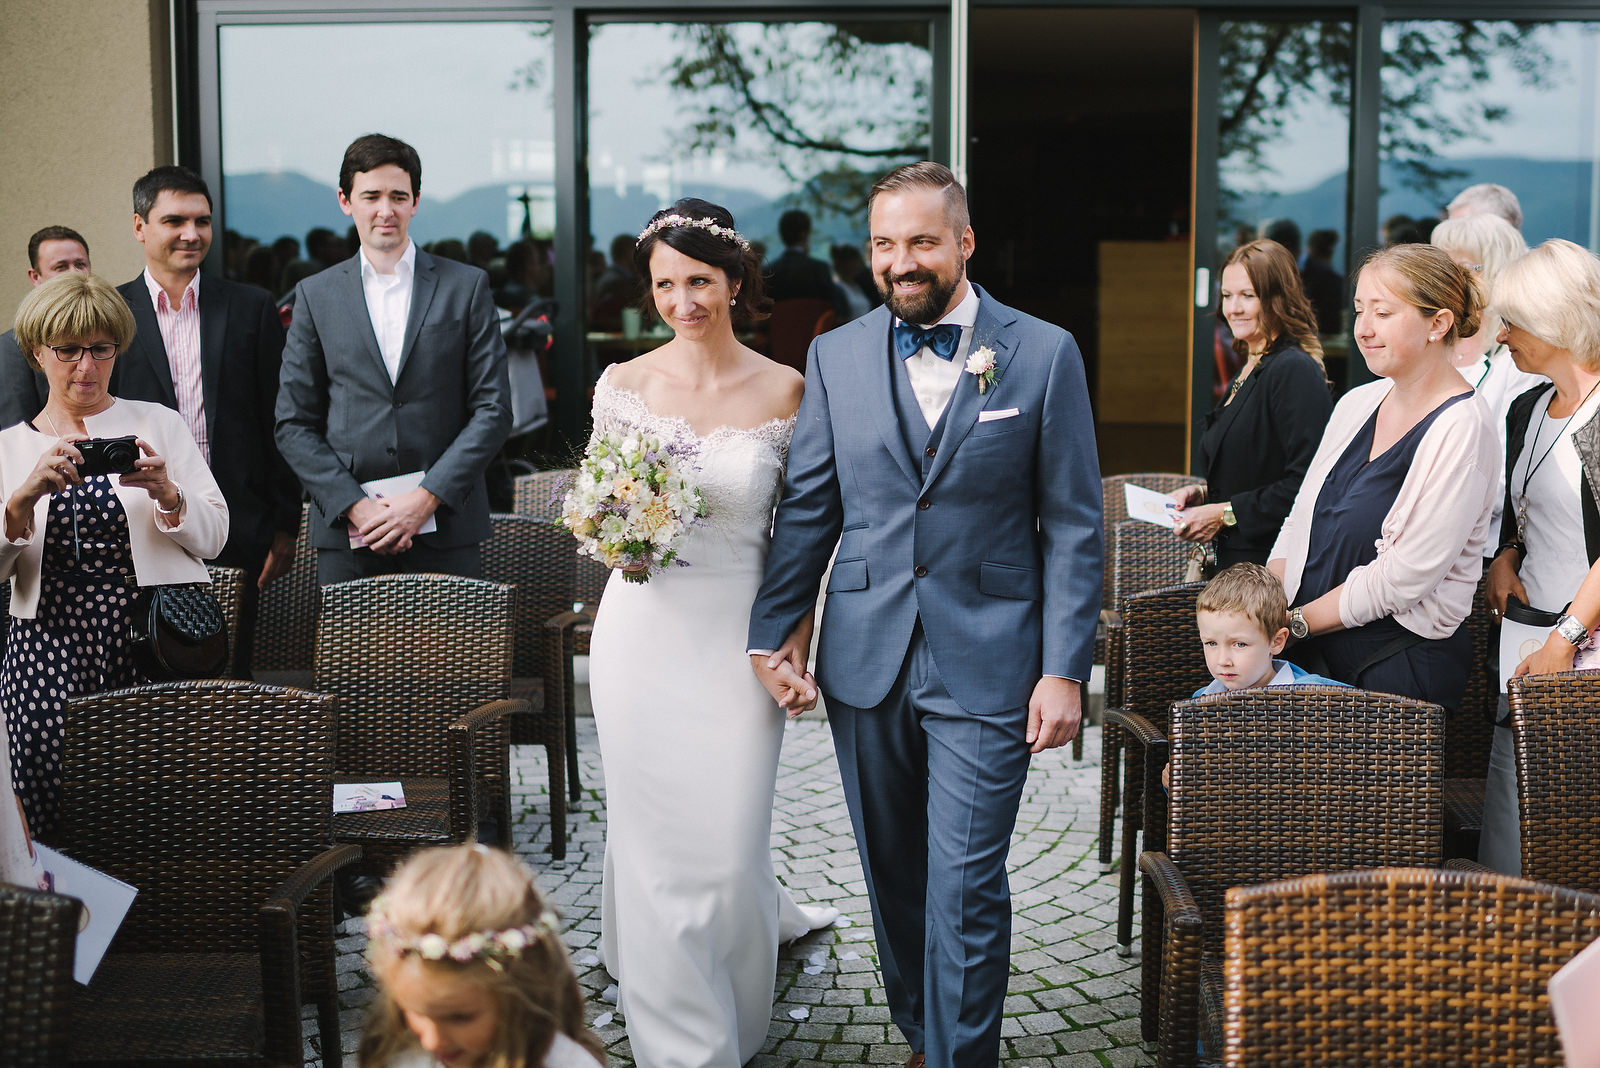 Fotograf Konstanz - Hochzeitsfotograf Reutlingen Achalm Hochzeit EFP 40 - Als Hochzeitsfotograf auf der Achalm, Reutlingen  - 33 -